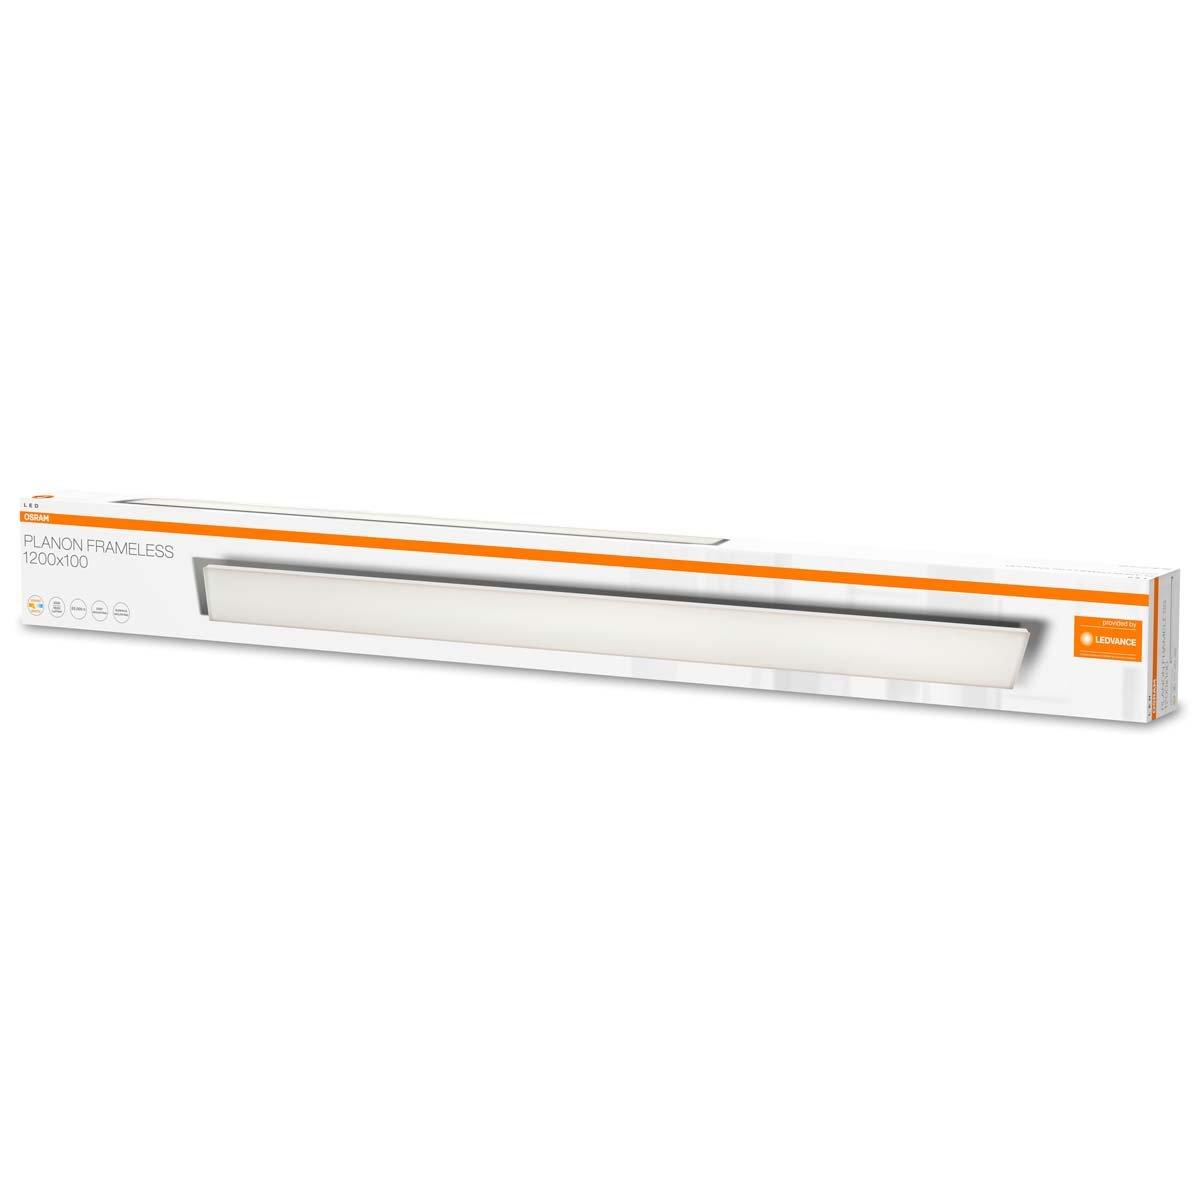 f/ür innenanwendungen Warmwei/ß L/änge: 120x30 cm Osram LED Planon Frameless Panel-Leuchte